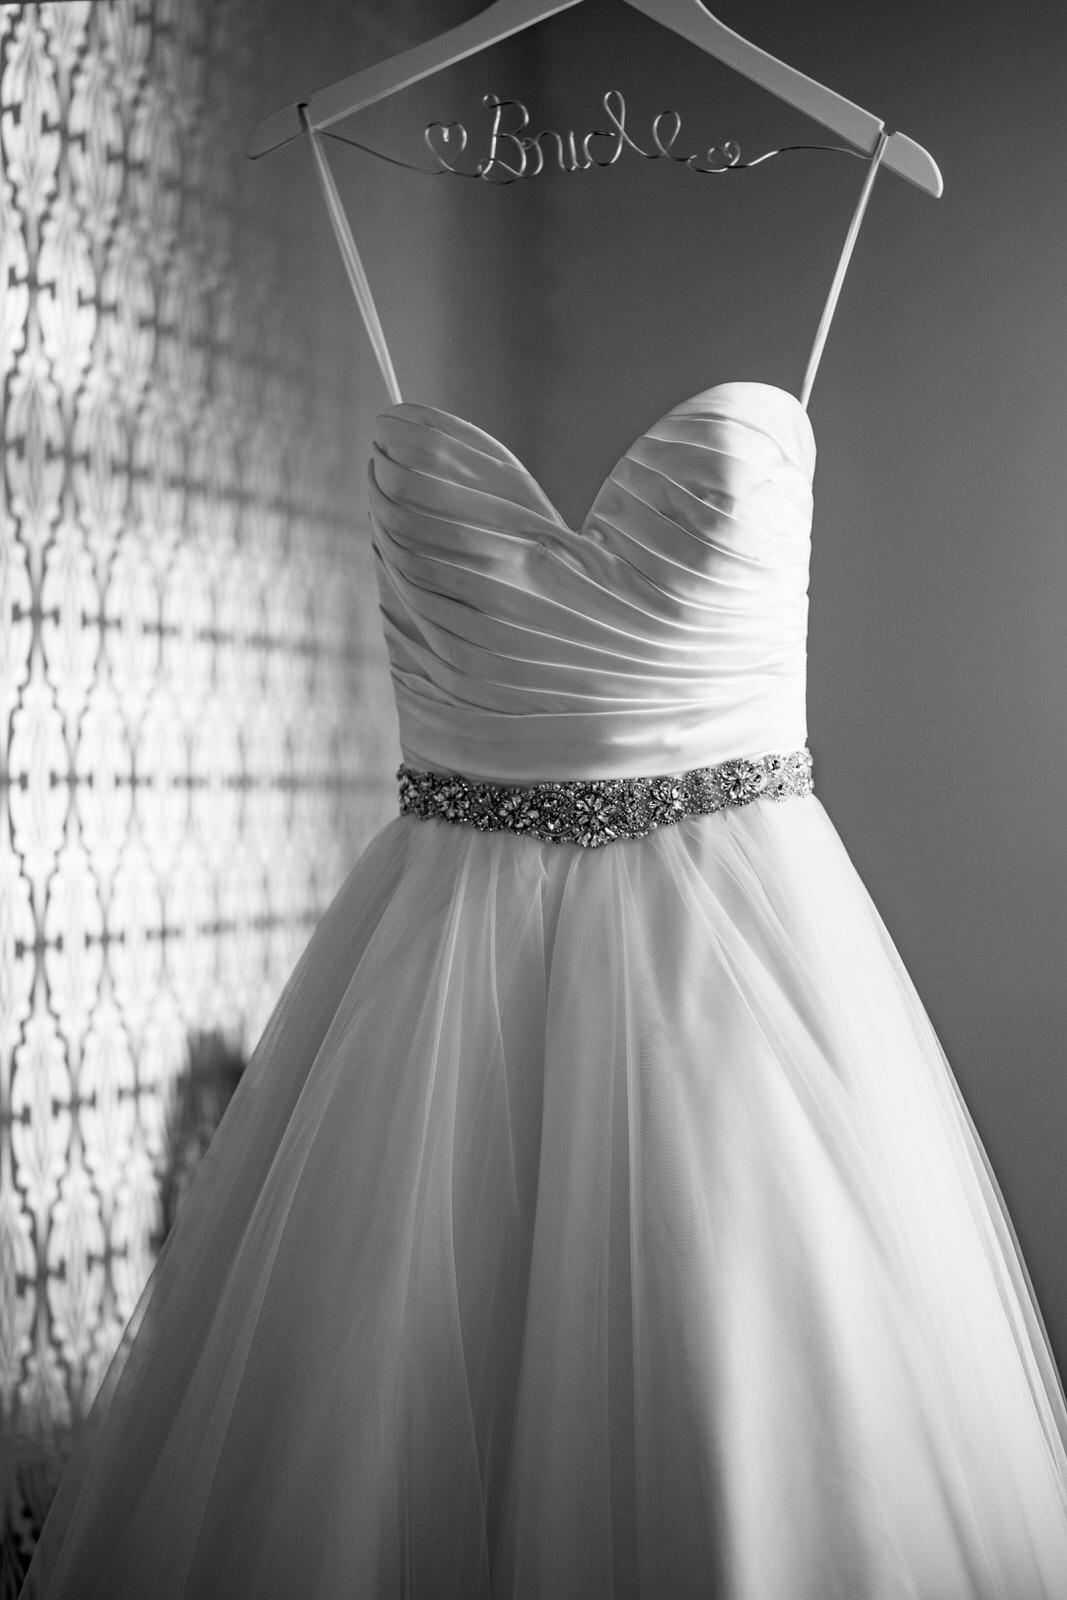 getting_ready_salon_wedding_day_stuart_wedding_photographer-6.jpg